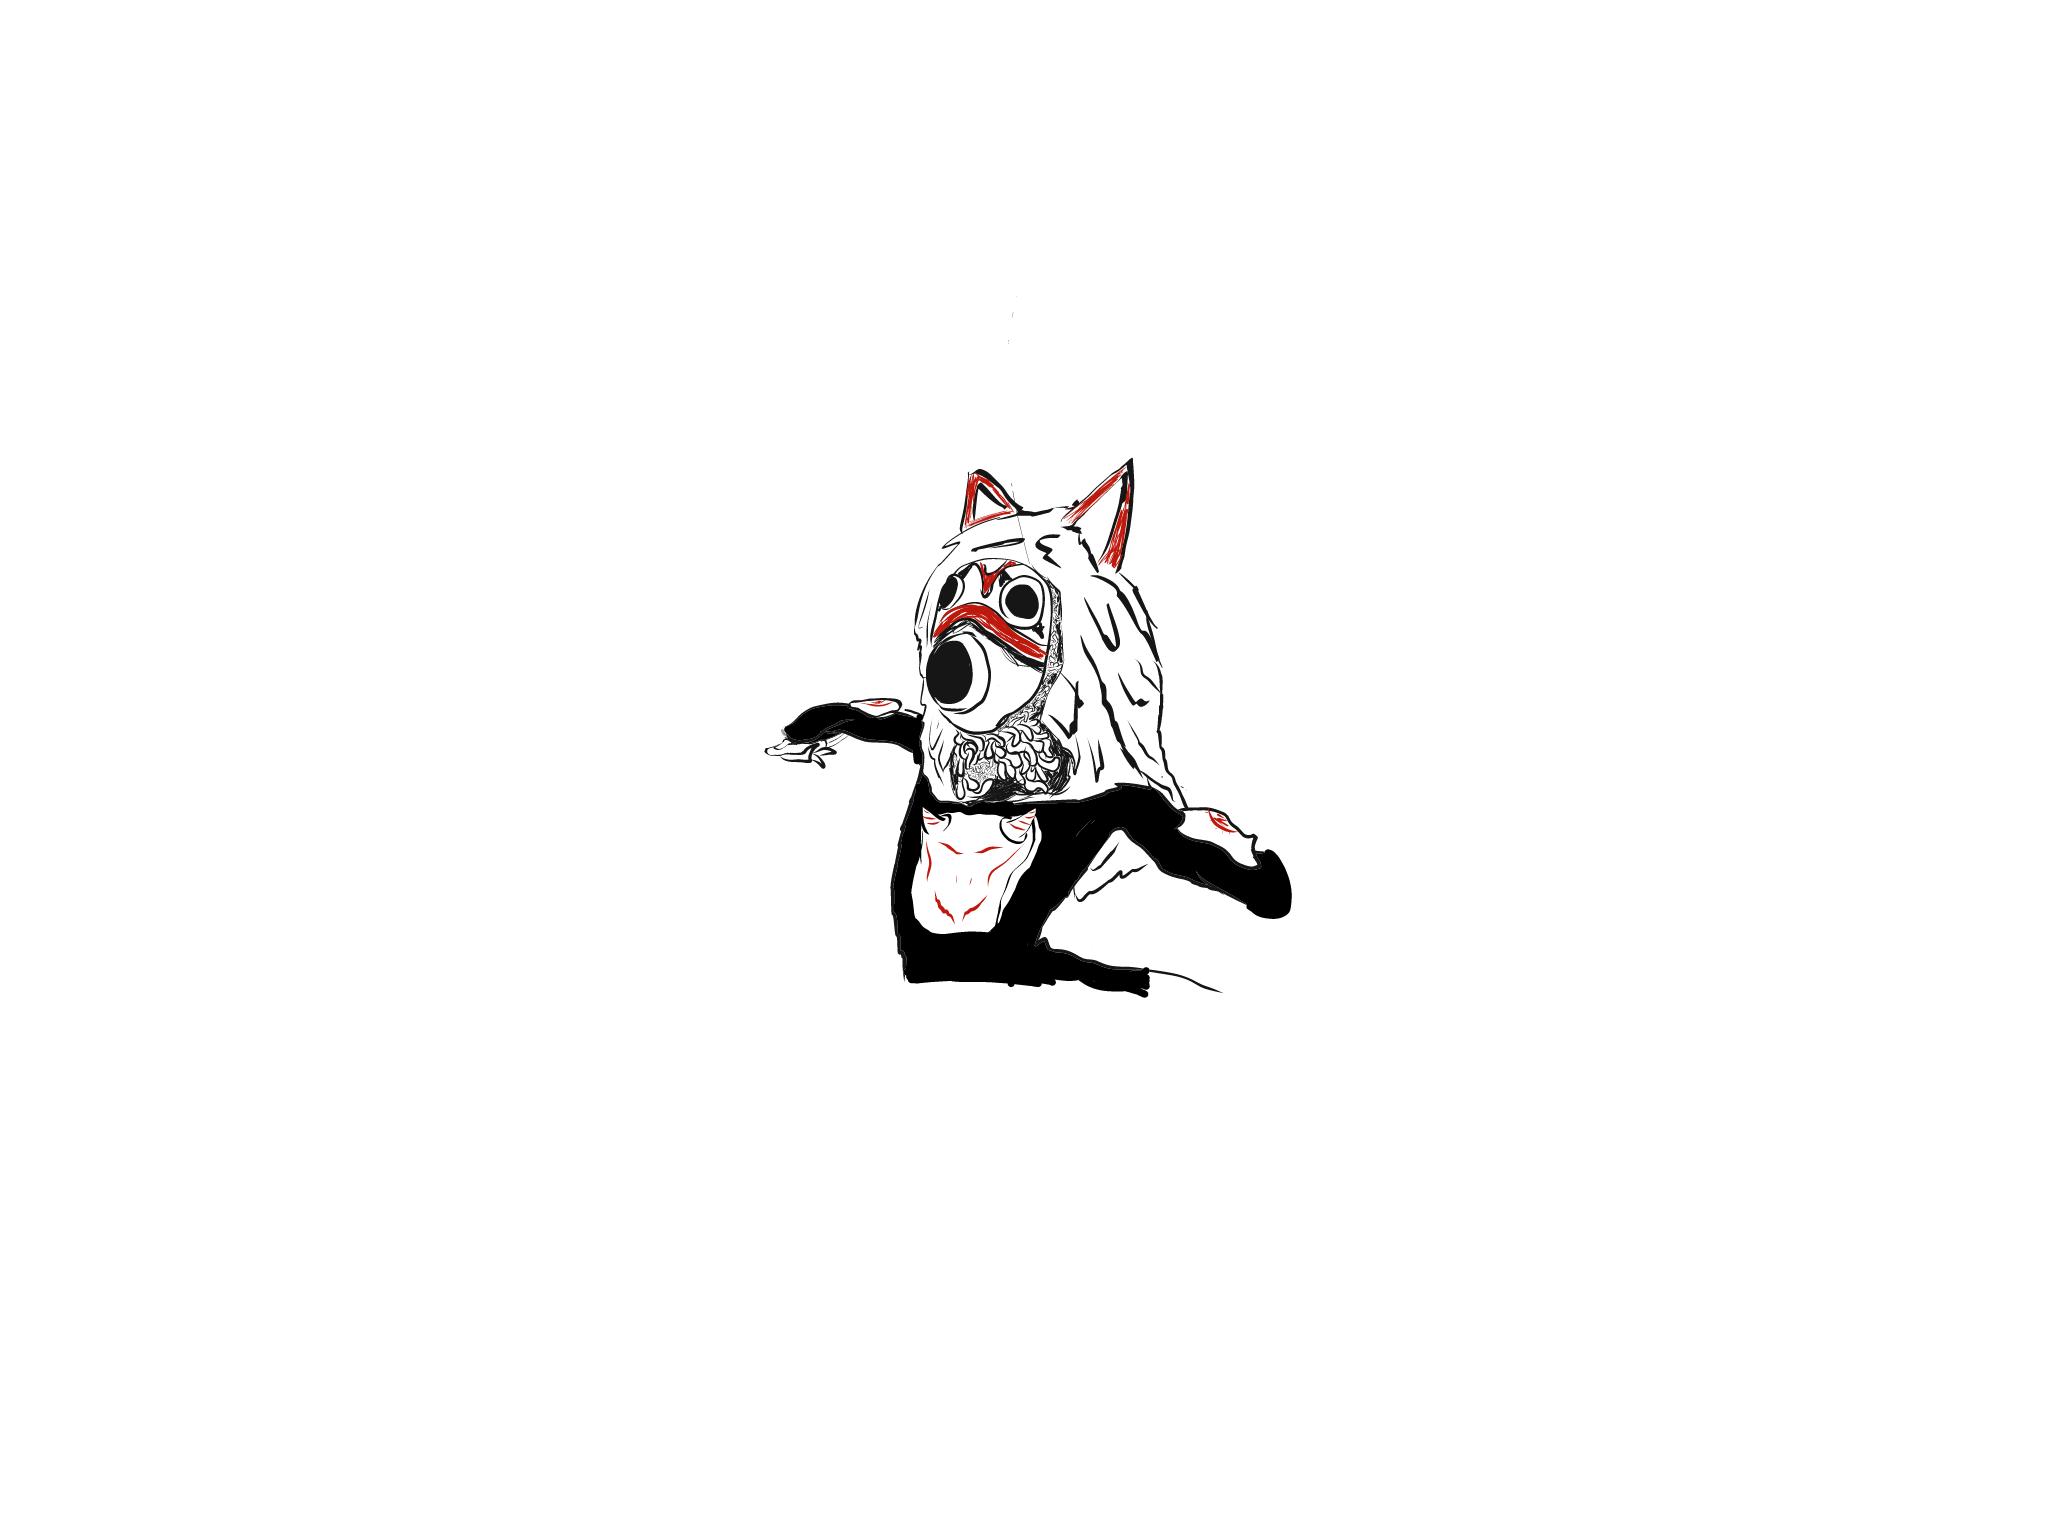 Old Mononoke/RWBY thing I drew